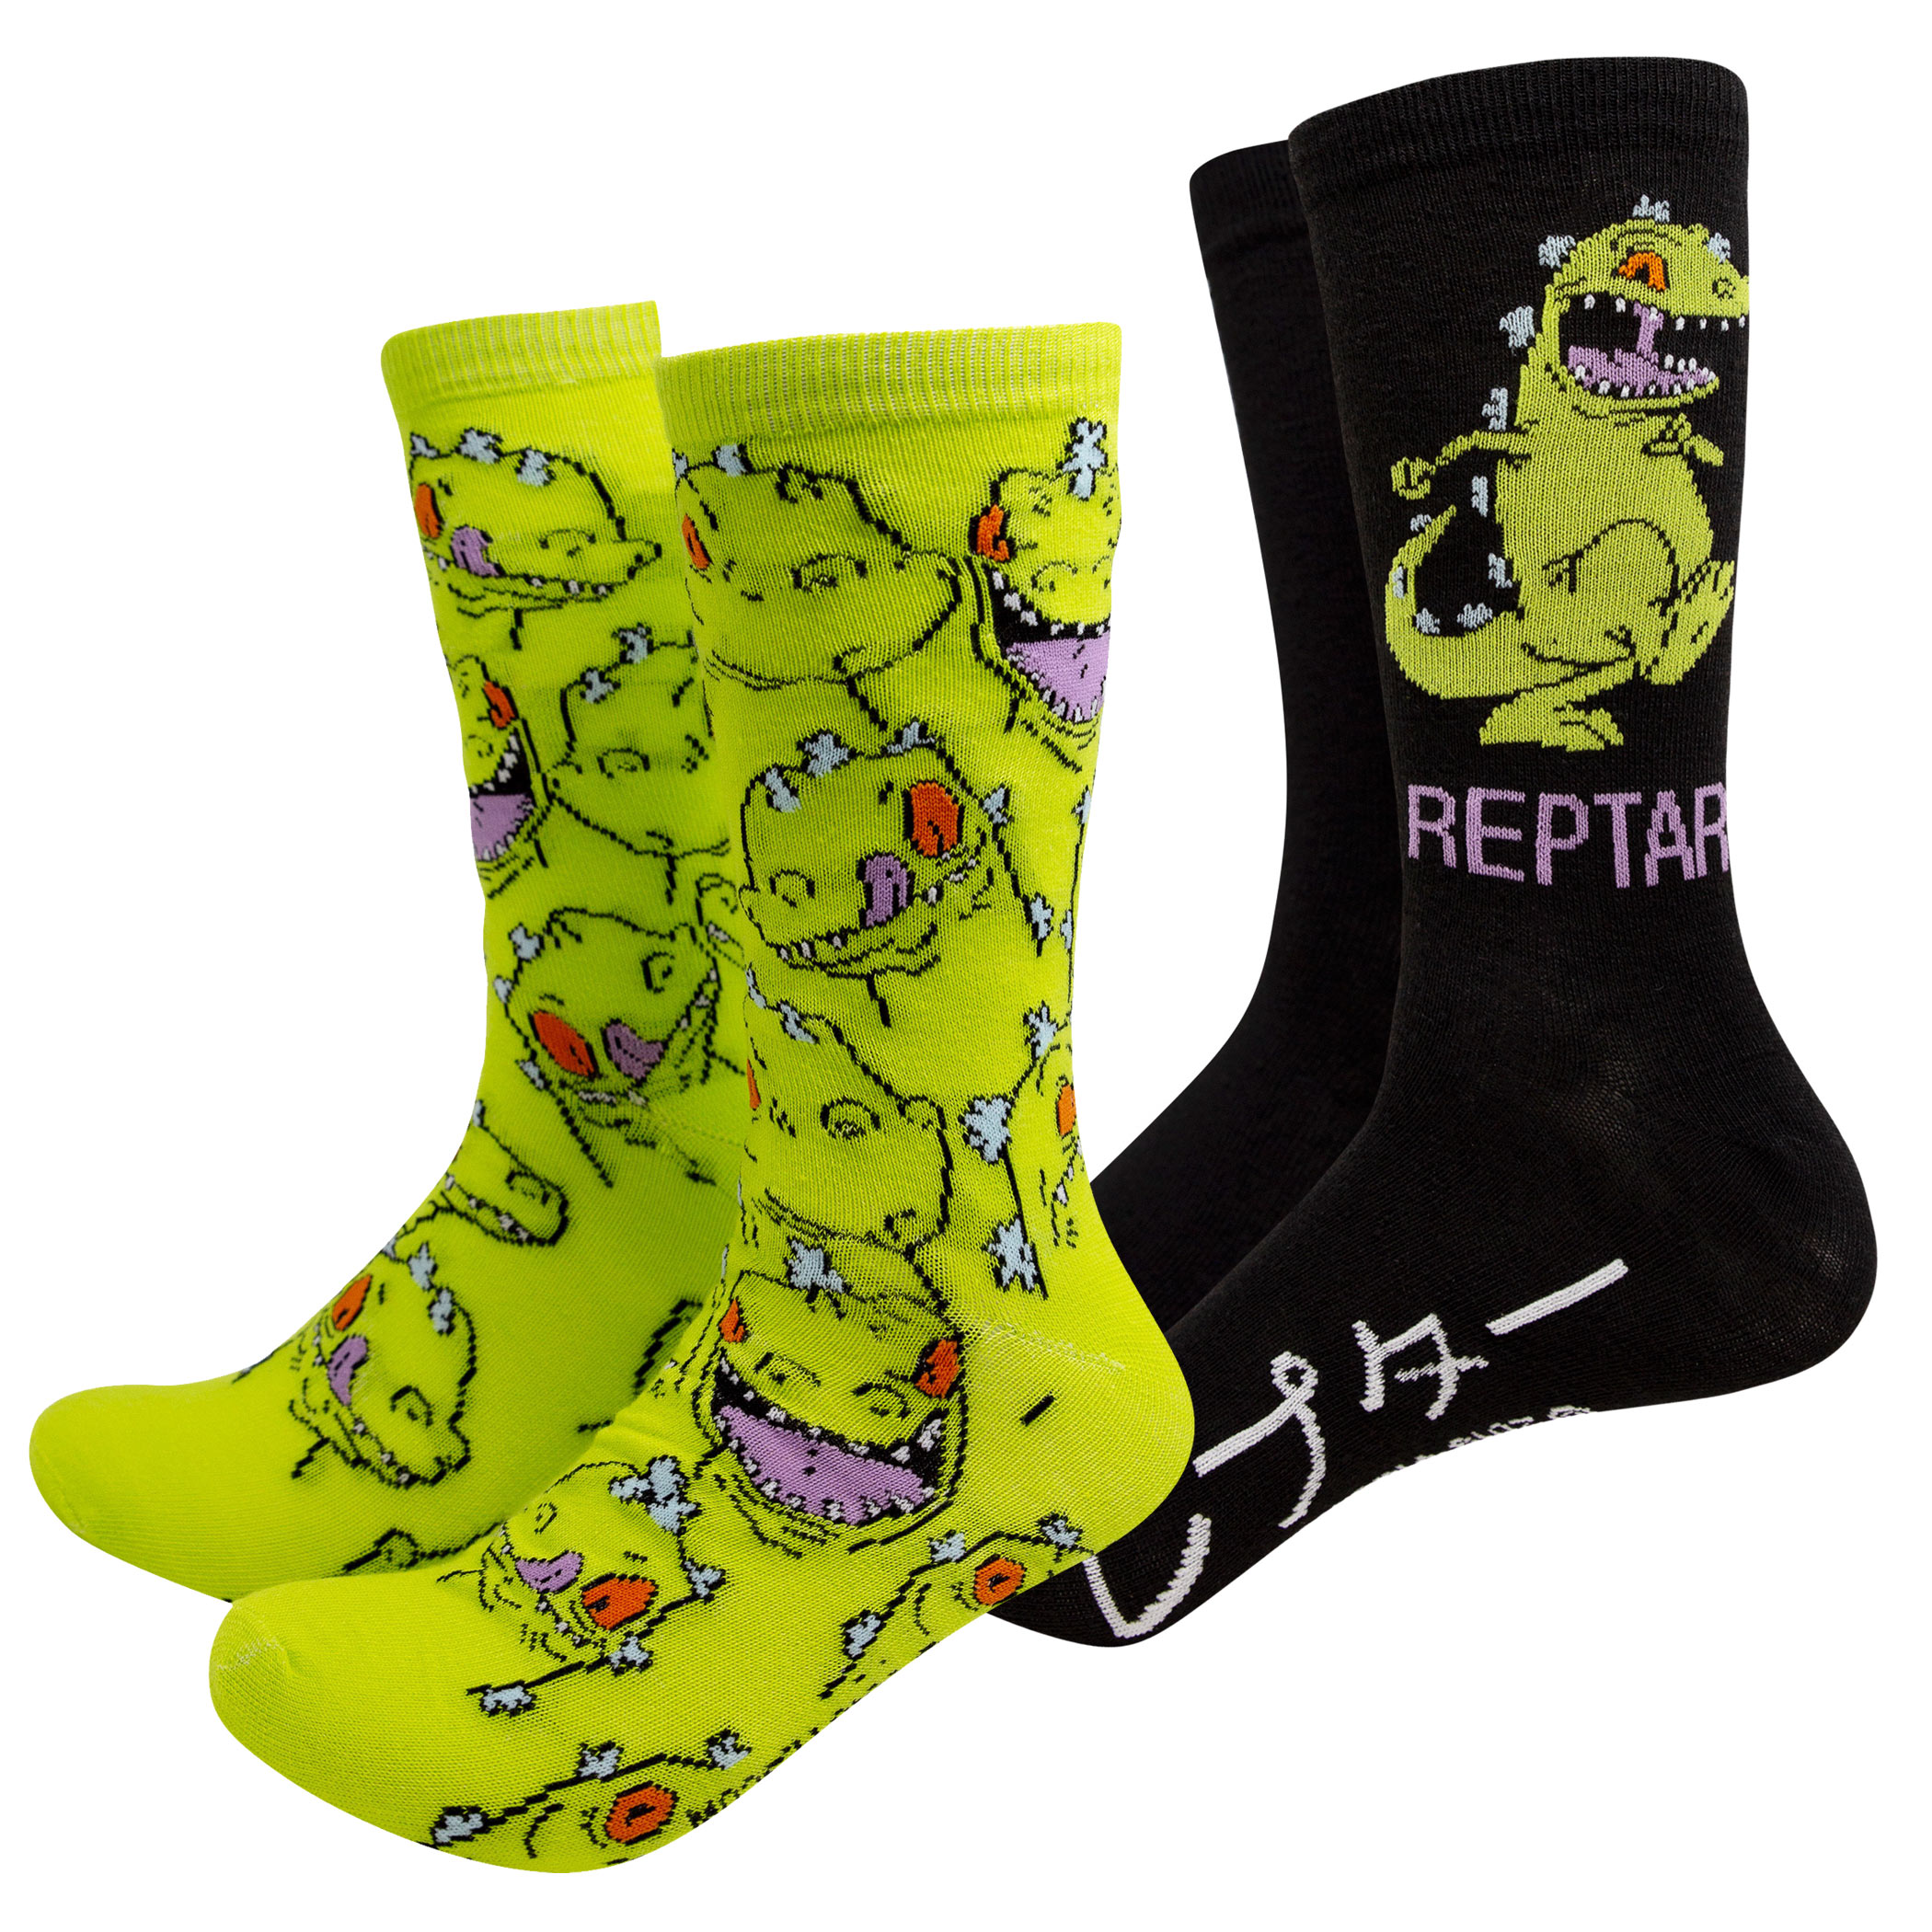 Rugrats Green And Black Reptar 2-Pack Crew Socks